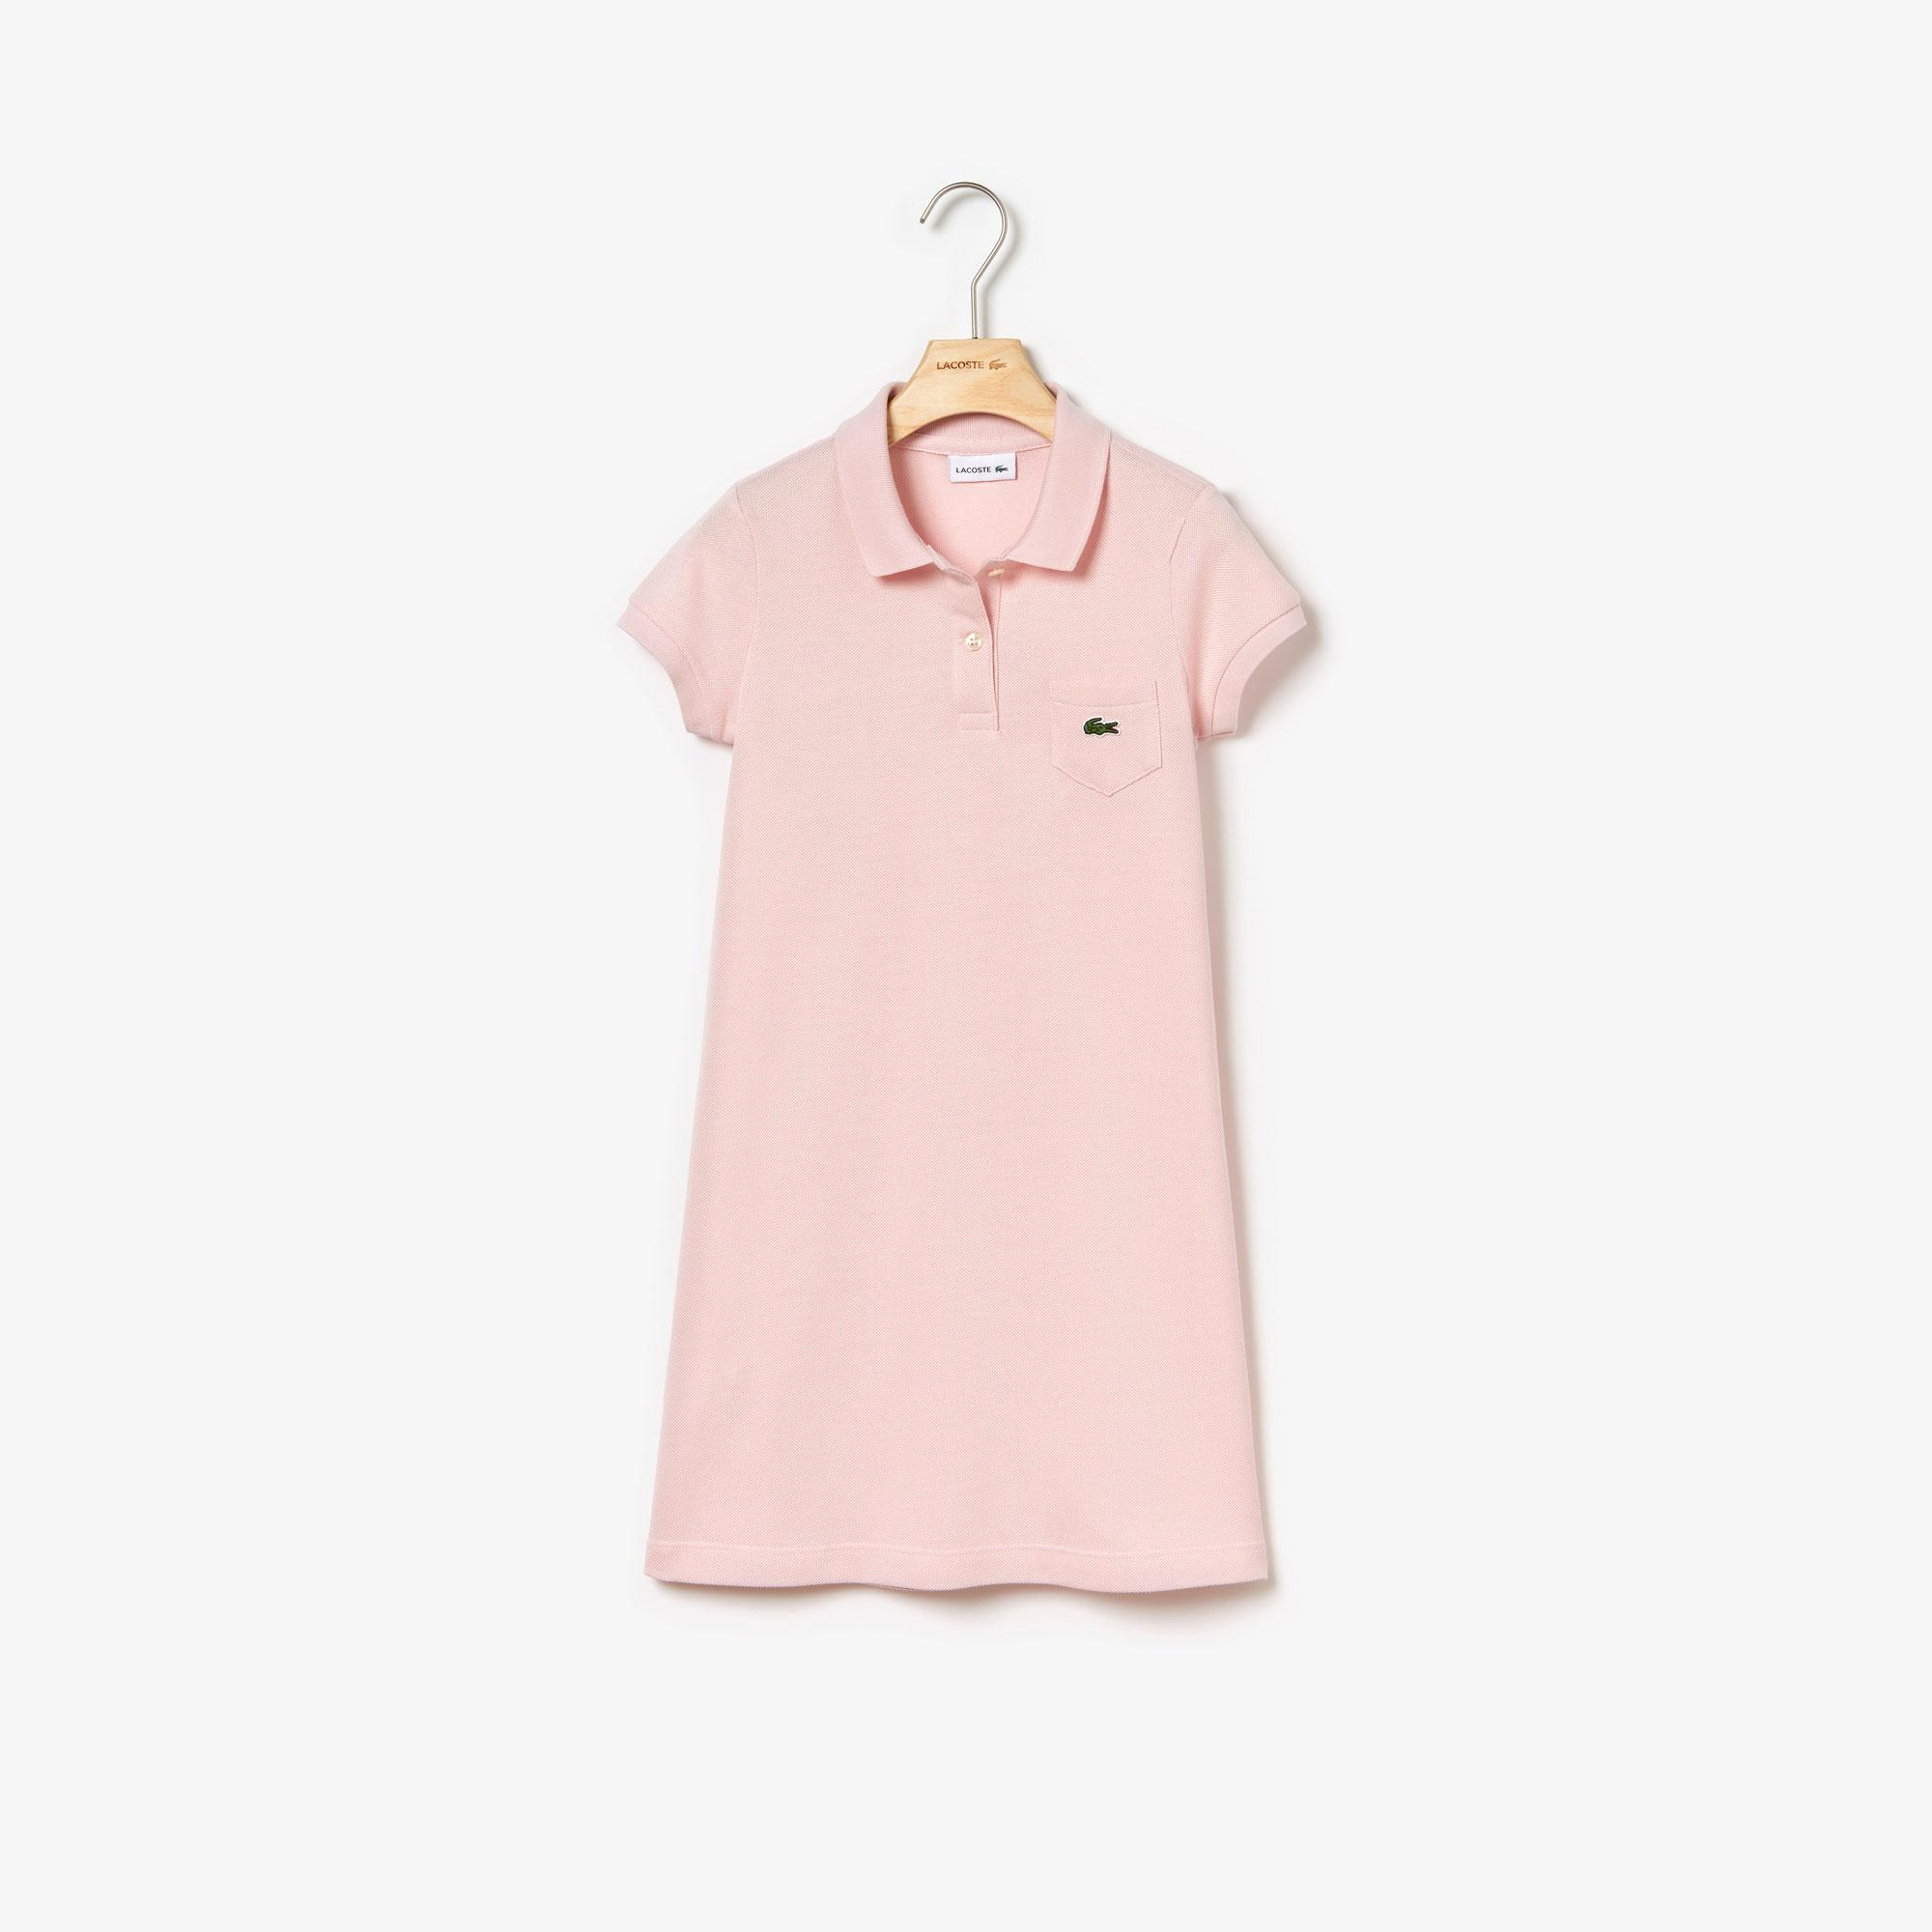 Lacoste Çocuk Polo Yaka Pembe Elbise